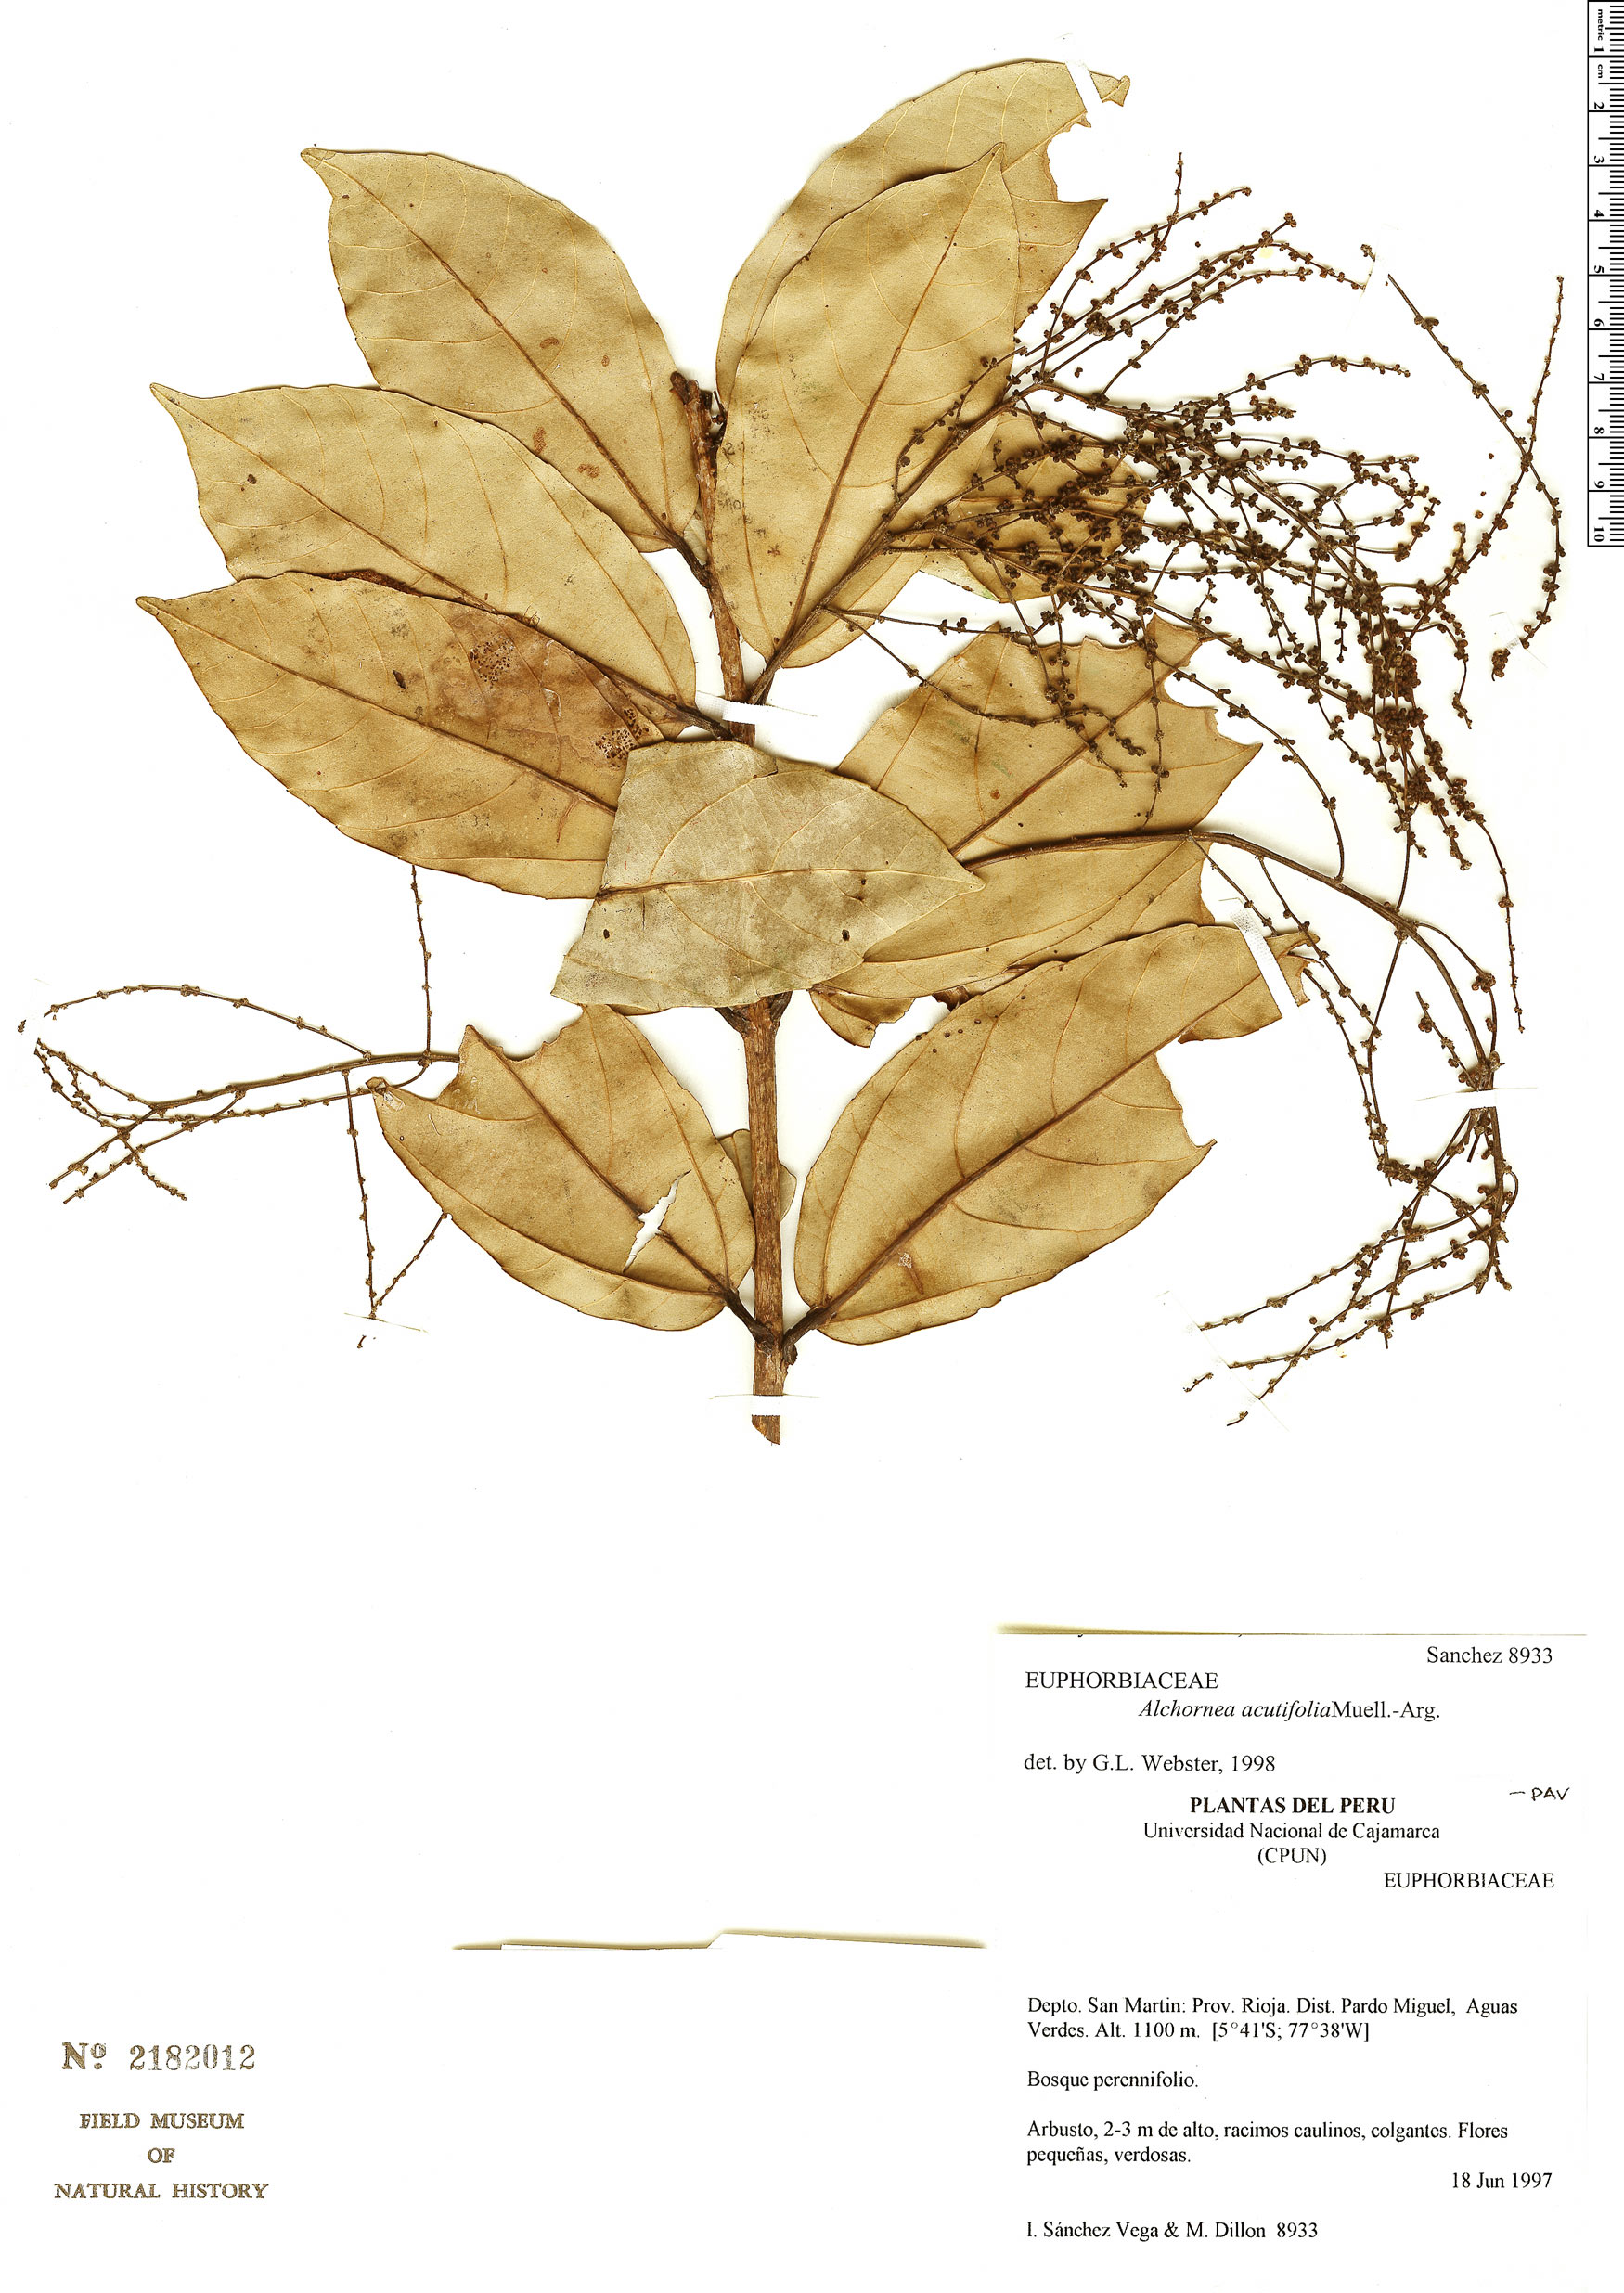 Specimen: Alchornea acutifolia